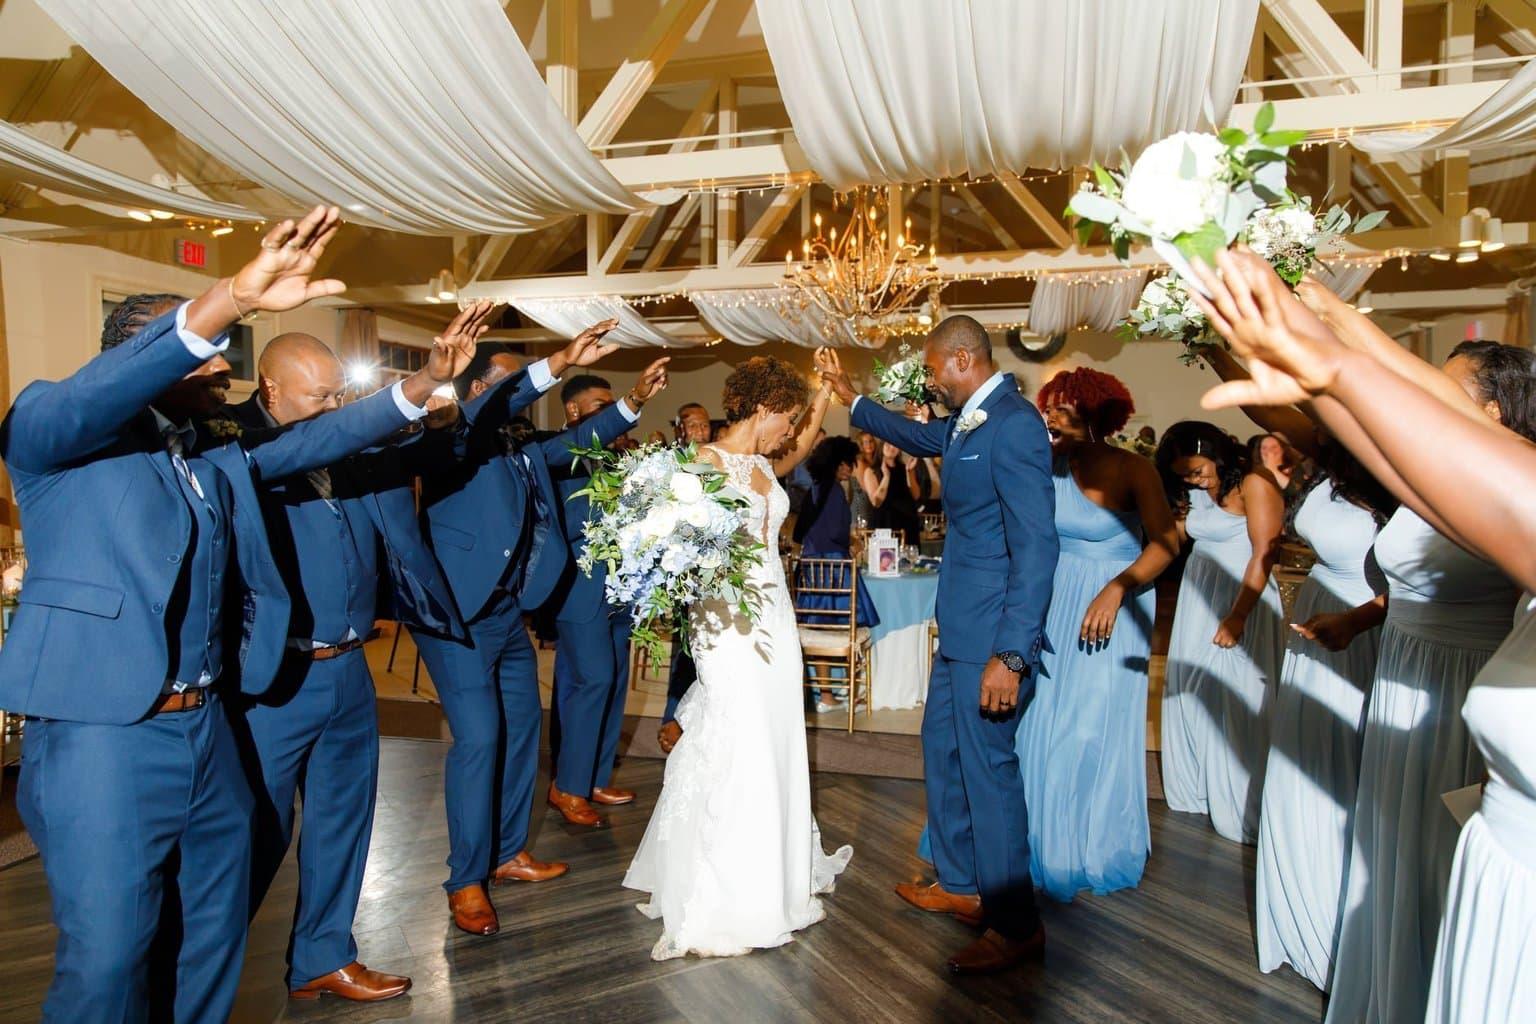 Bride and Groom reception entrance Navy suits, Blue Bridesmaids dresses